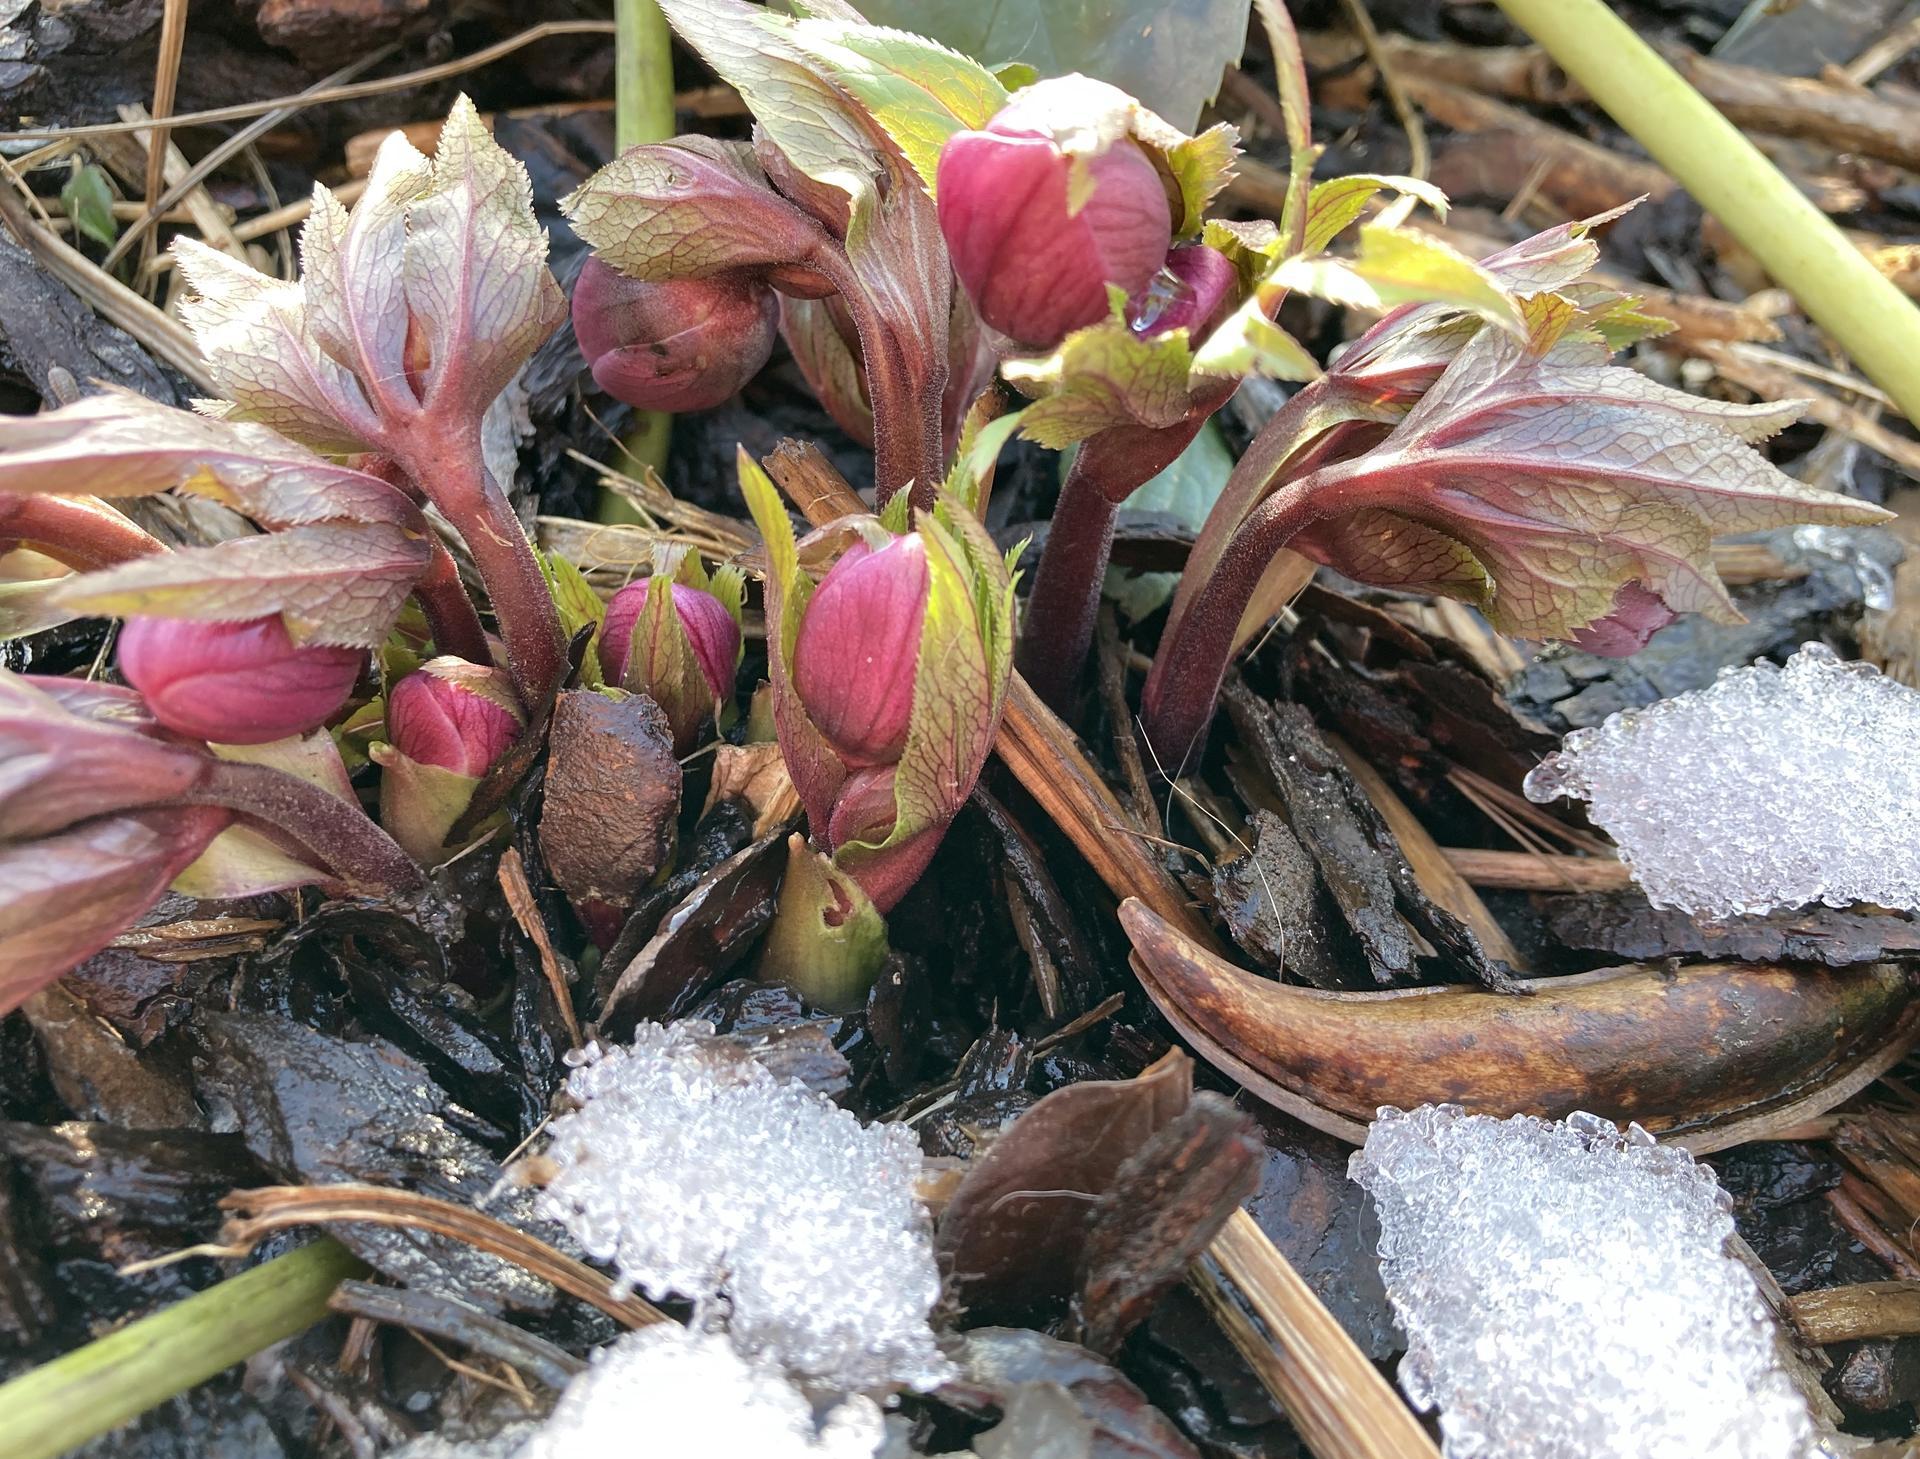 Zahrada 2021 - Cemerice ... prvni poslicek faktu, ze jaro uz se pomalinku chysta a ze BUDE 😃🥰!